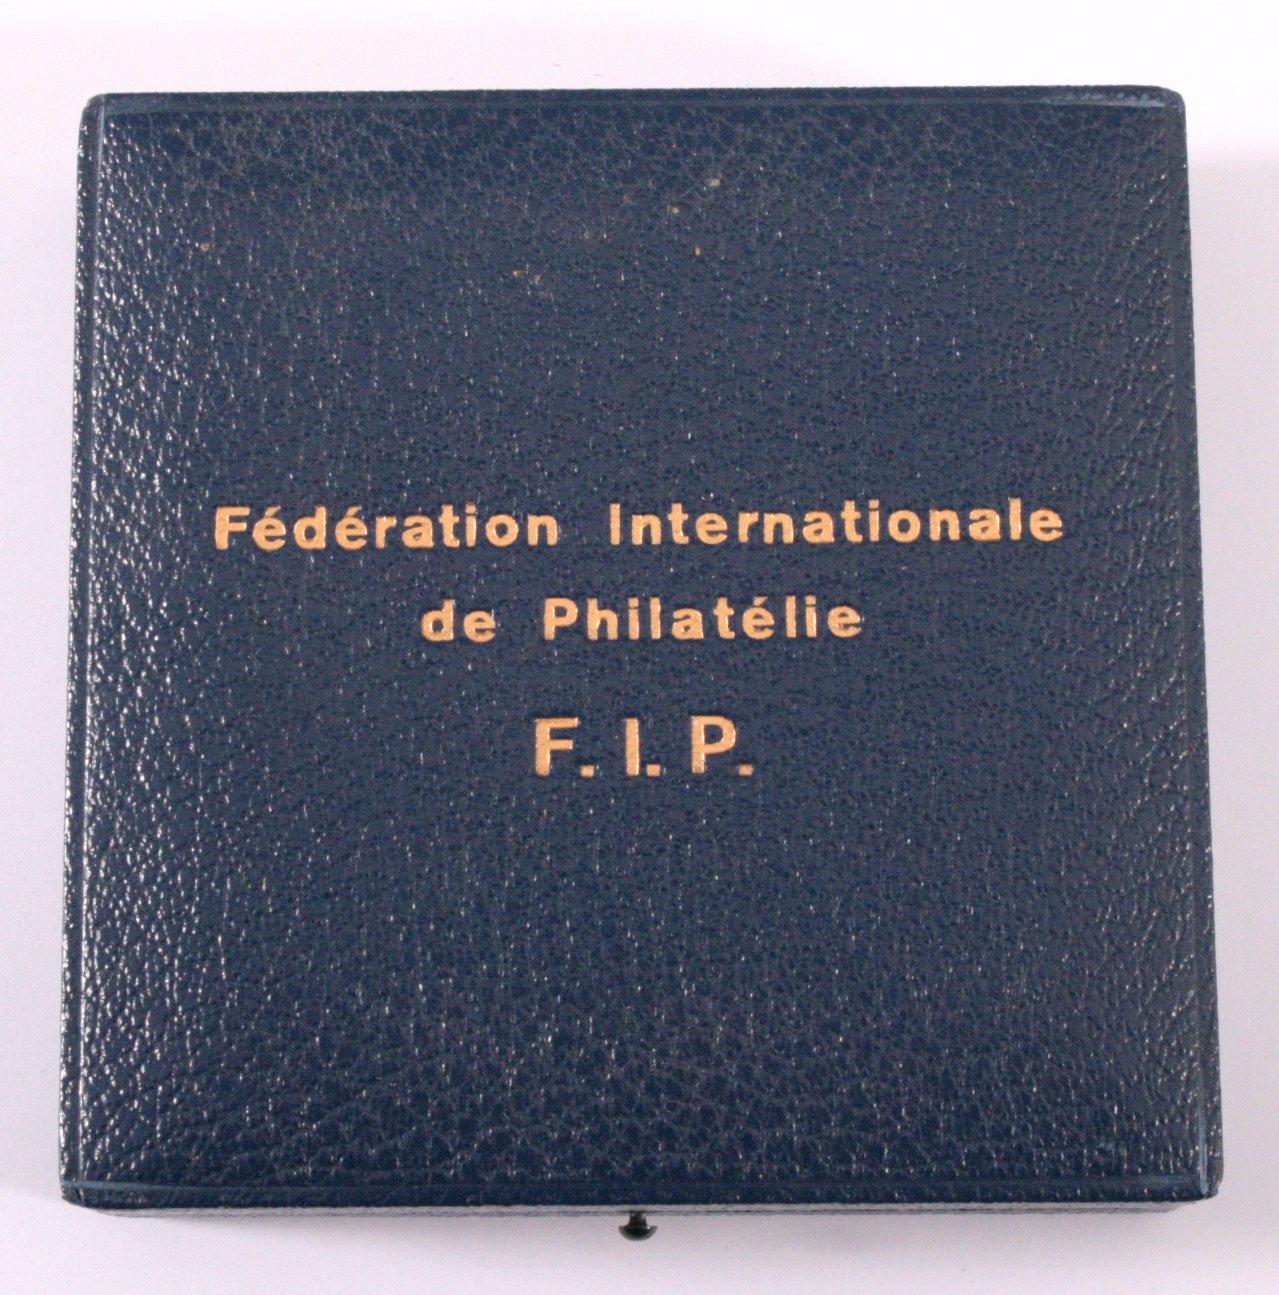 Medaille Fédération Internationale de Philatélie-2